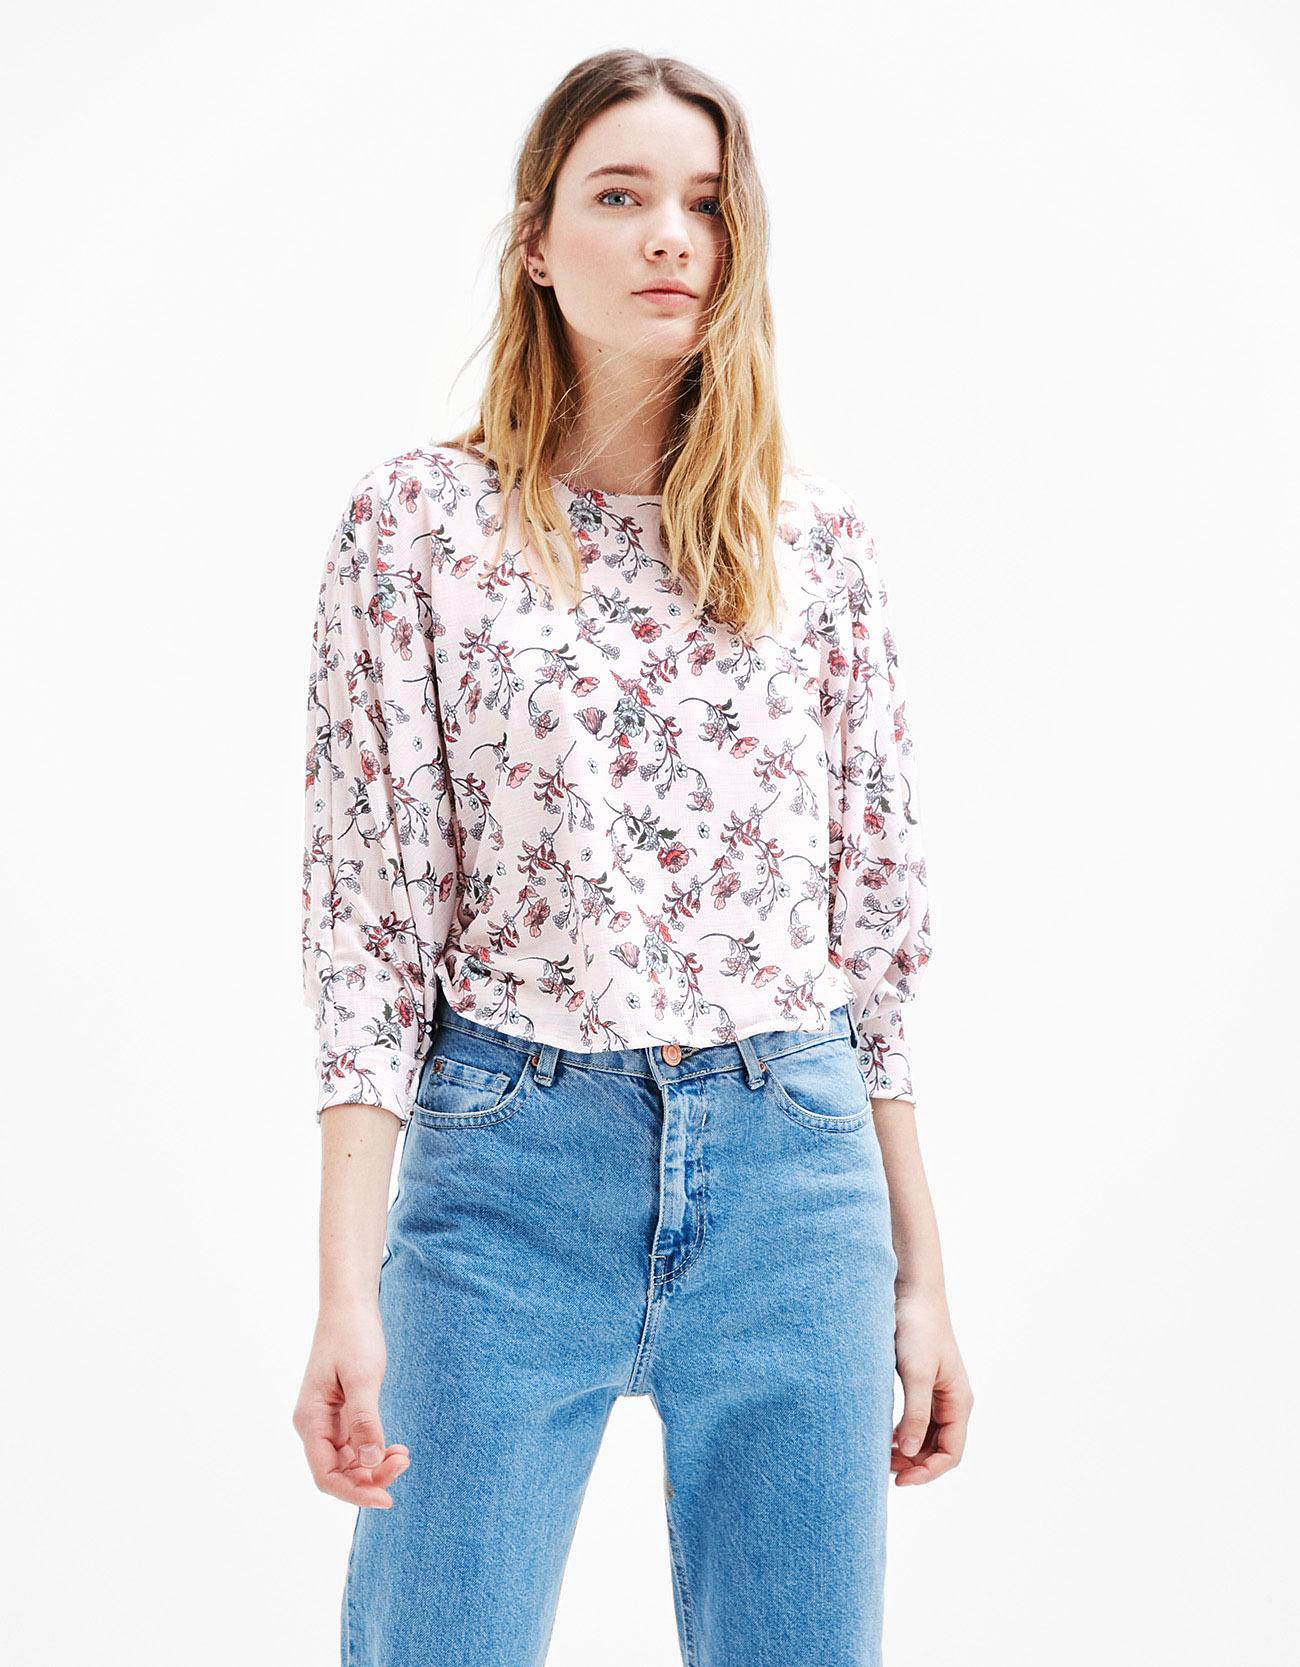 Sayuri Villalba – Bershka – Flowers in Pink4